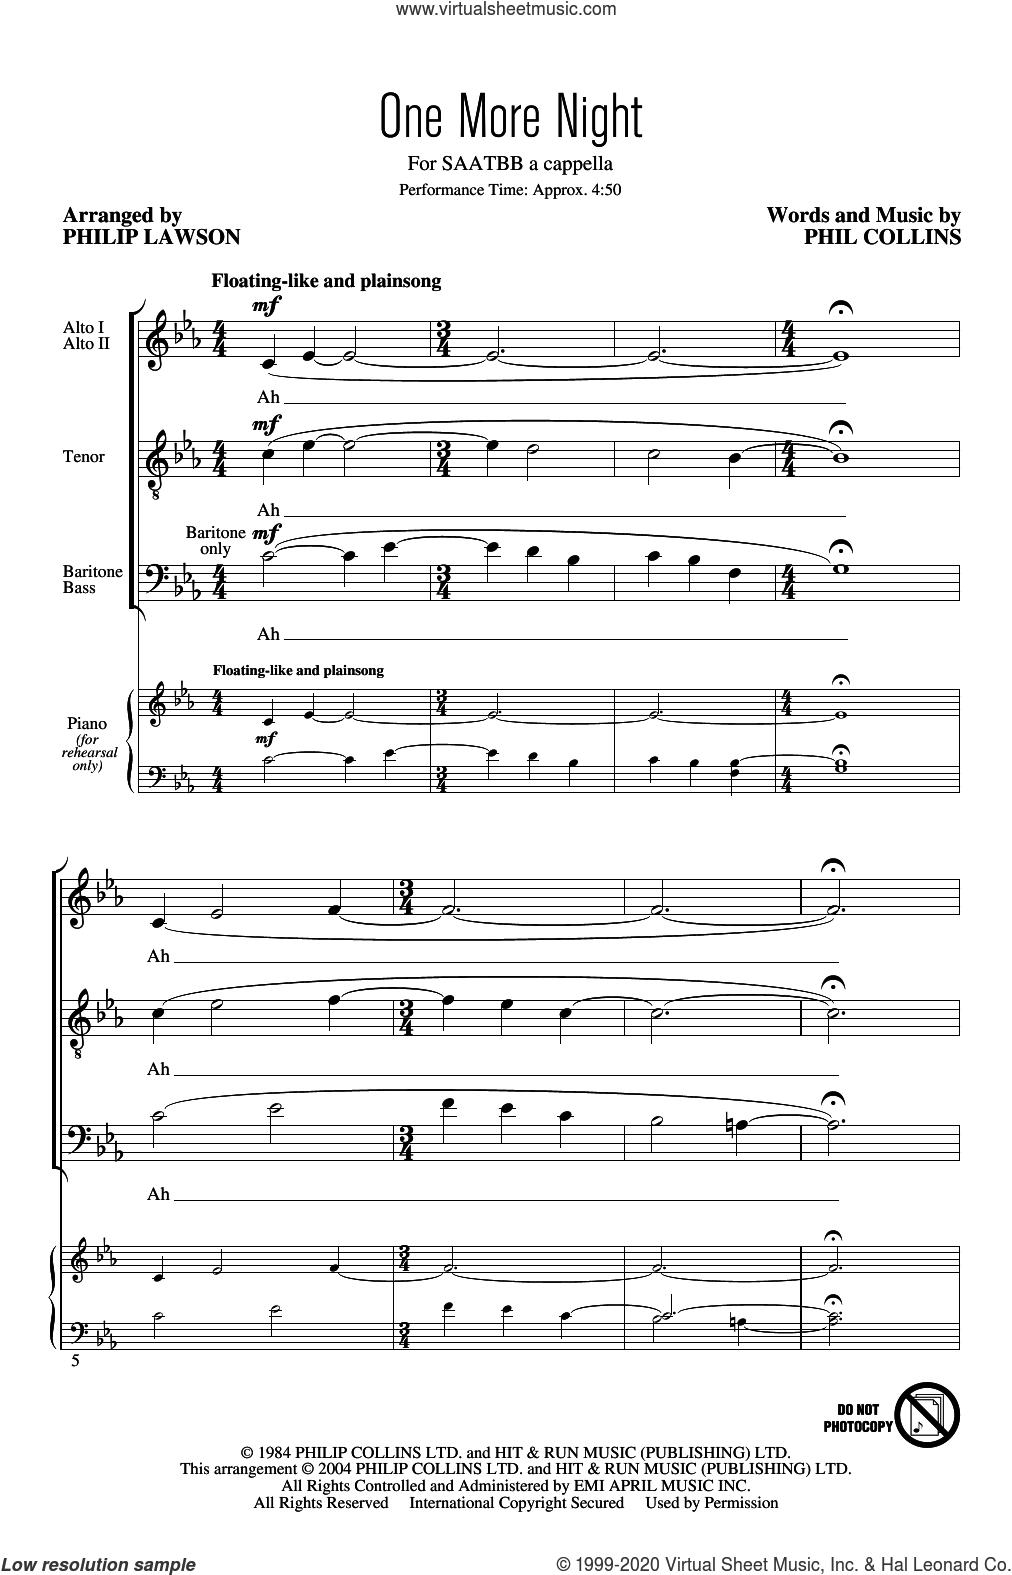 One More Night (arr. Philip Lawson) sheet music for choir (SATB: soprano, alto, tenor, bass) by Phil Collins and Philip Lawson, intermediate skill level